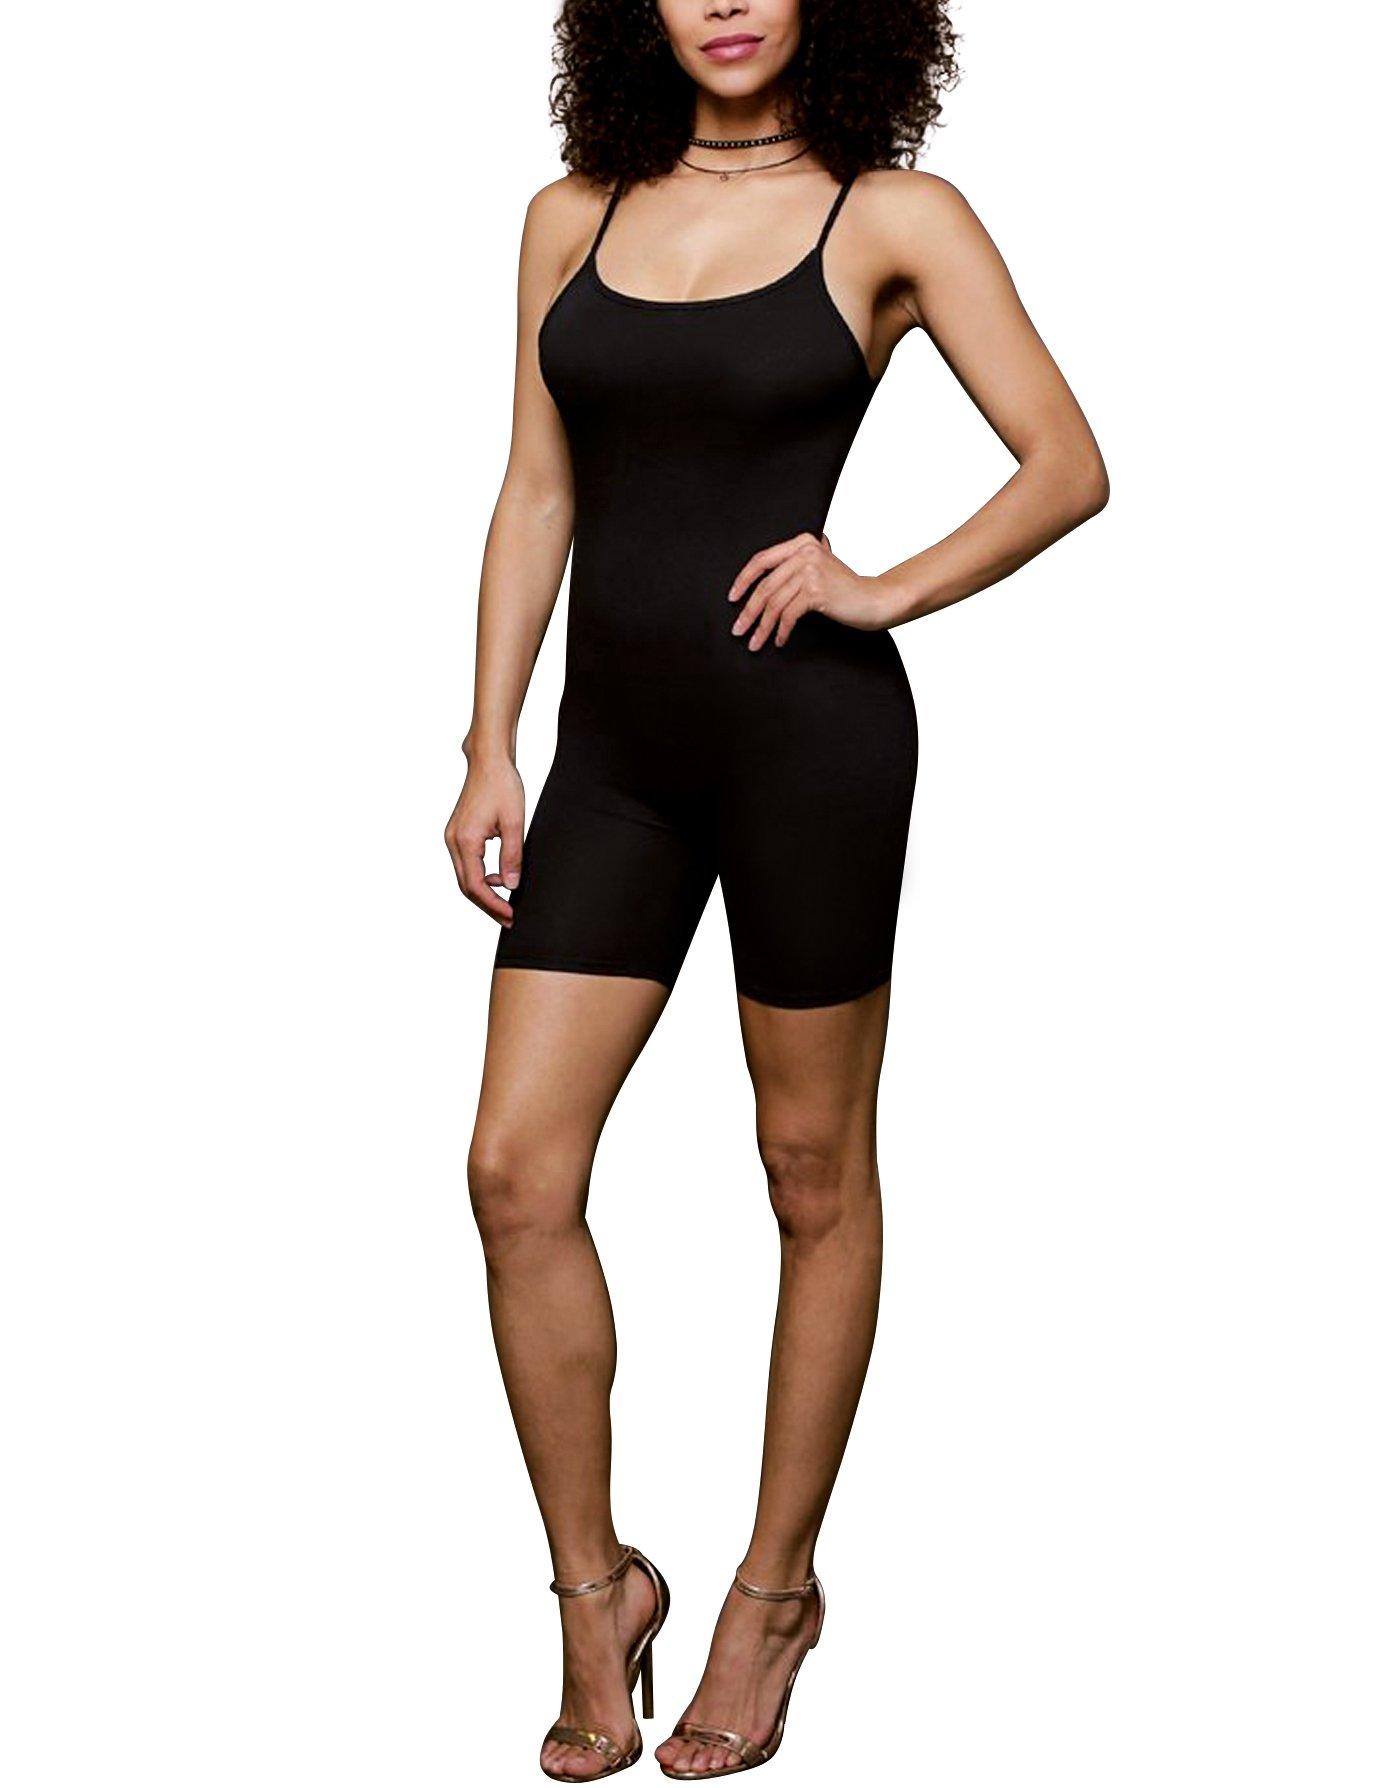 Amiliashp Women's Spaghetti Strap Tank Top Short Jumpsuit Rompers Bodysuit One Piece Catsuit